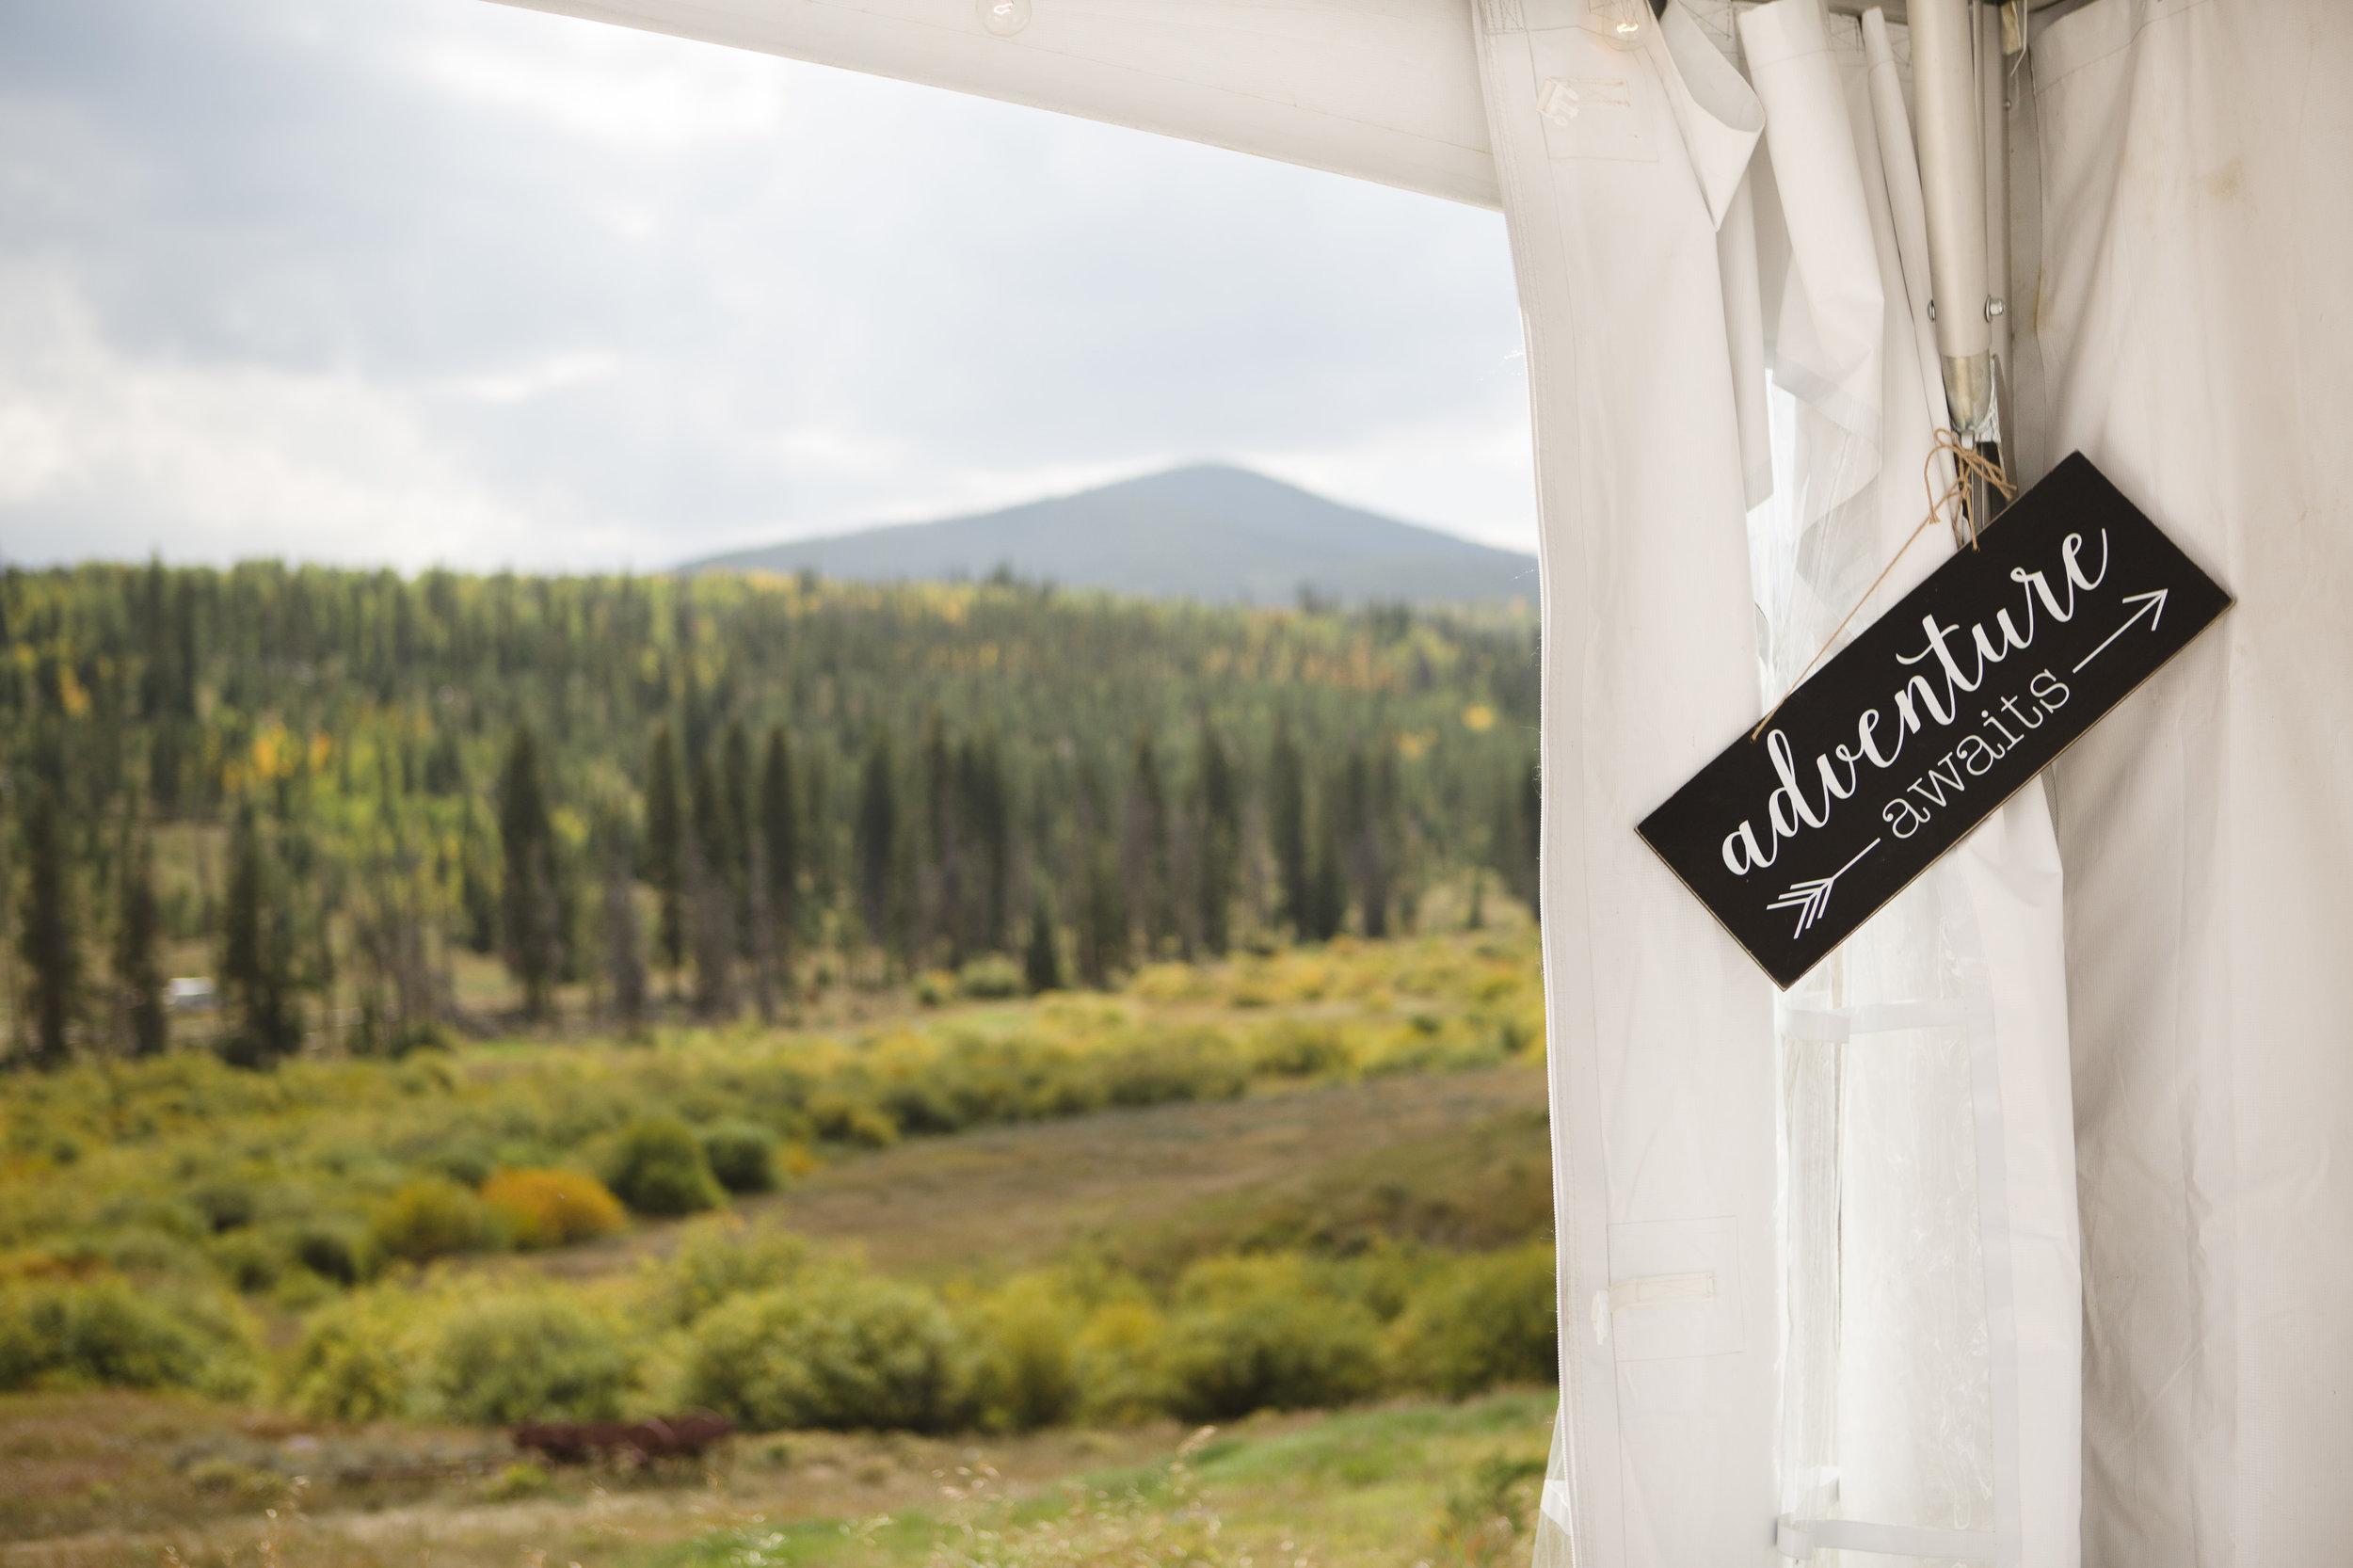 kristen-vance-moose-lodge-crooked-creek-fraser-colorado-wedding-2017.jpg